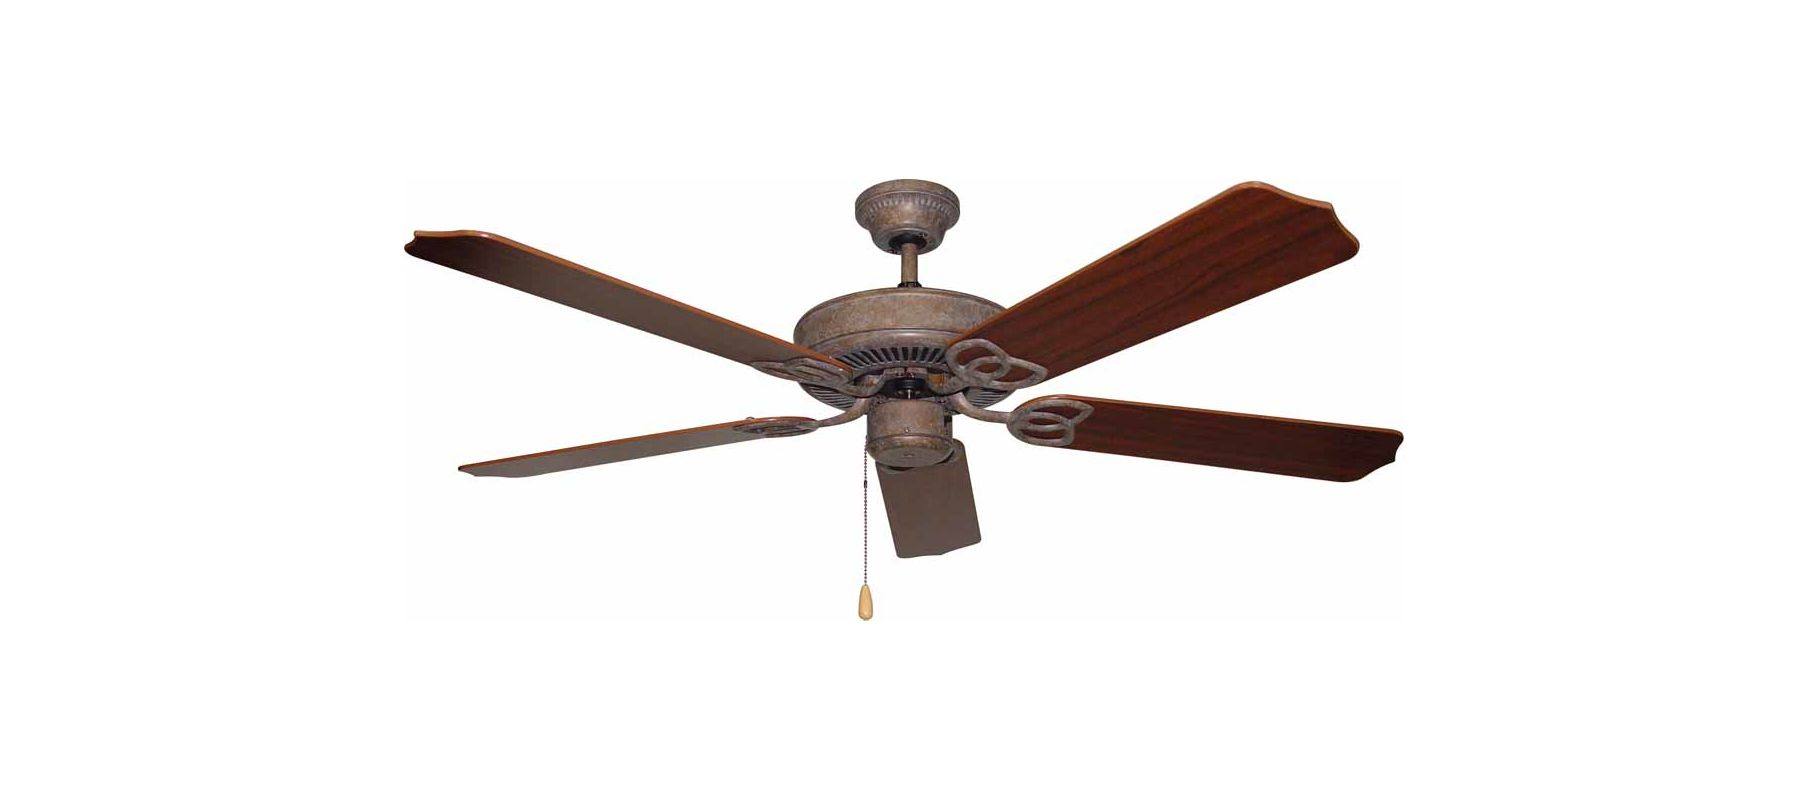 "Volume Lighting V6152 5 Blade 52"" Indoor Ceiling Fan Prairie Rock Fans"